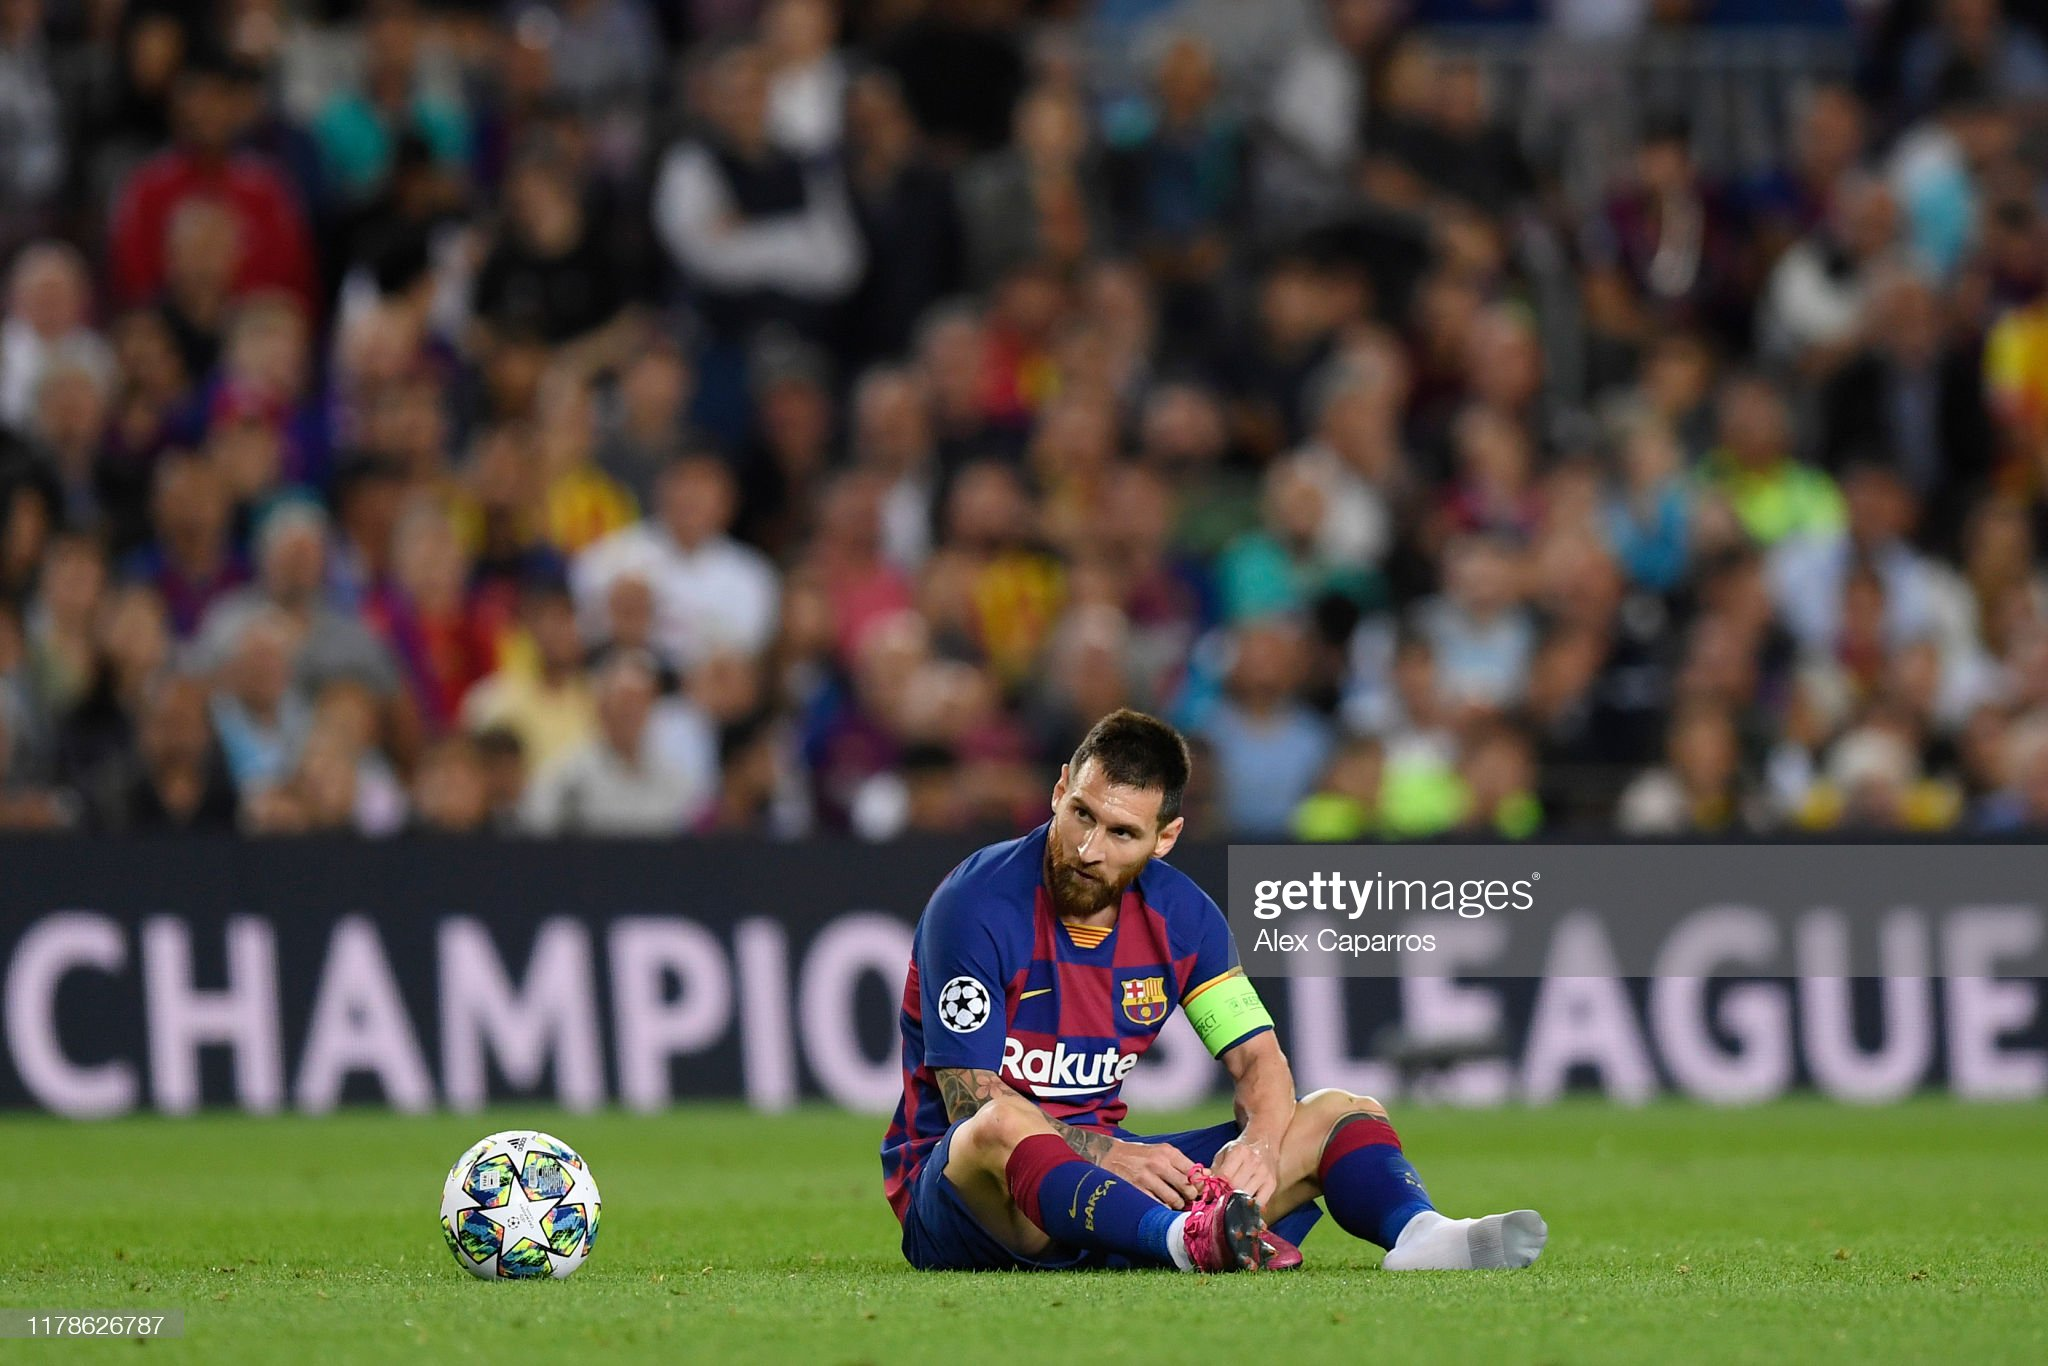 صور مباراة : برشلونة - إنتر 2-1 ( 02-10-2019 )  Lionel-messi-of-fc-barcelona-reacts-during-the-uefa-champions-league-picture-id1178626787?s=2048x2048